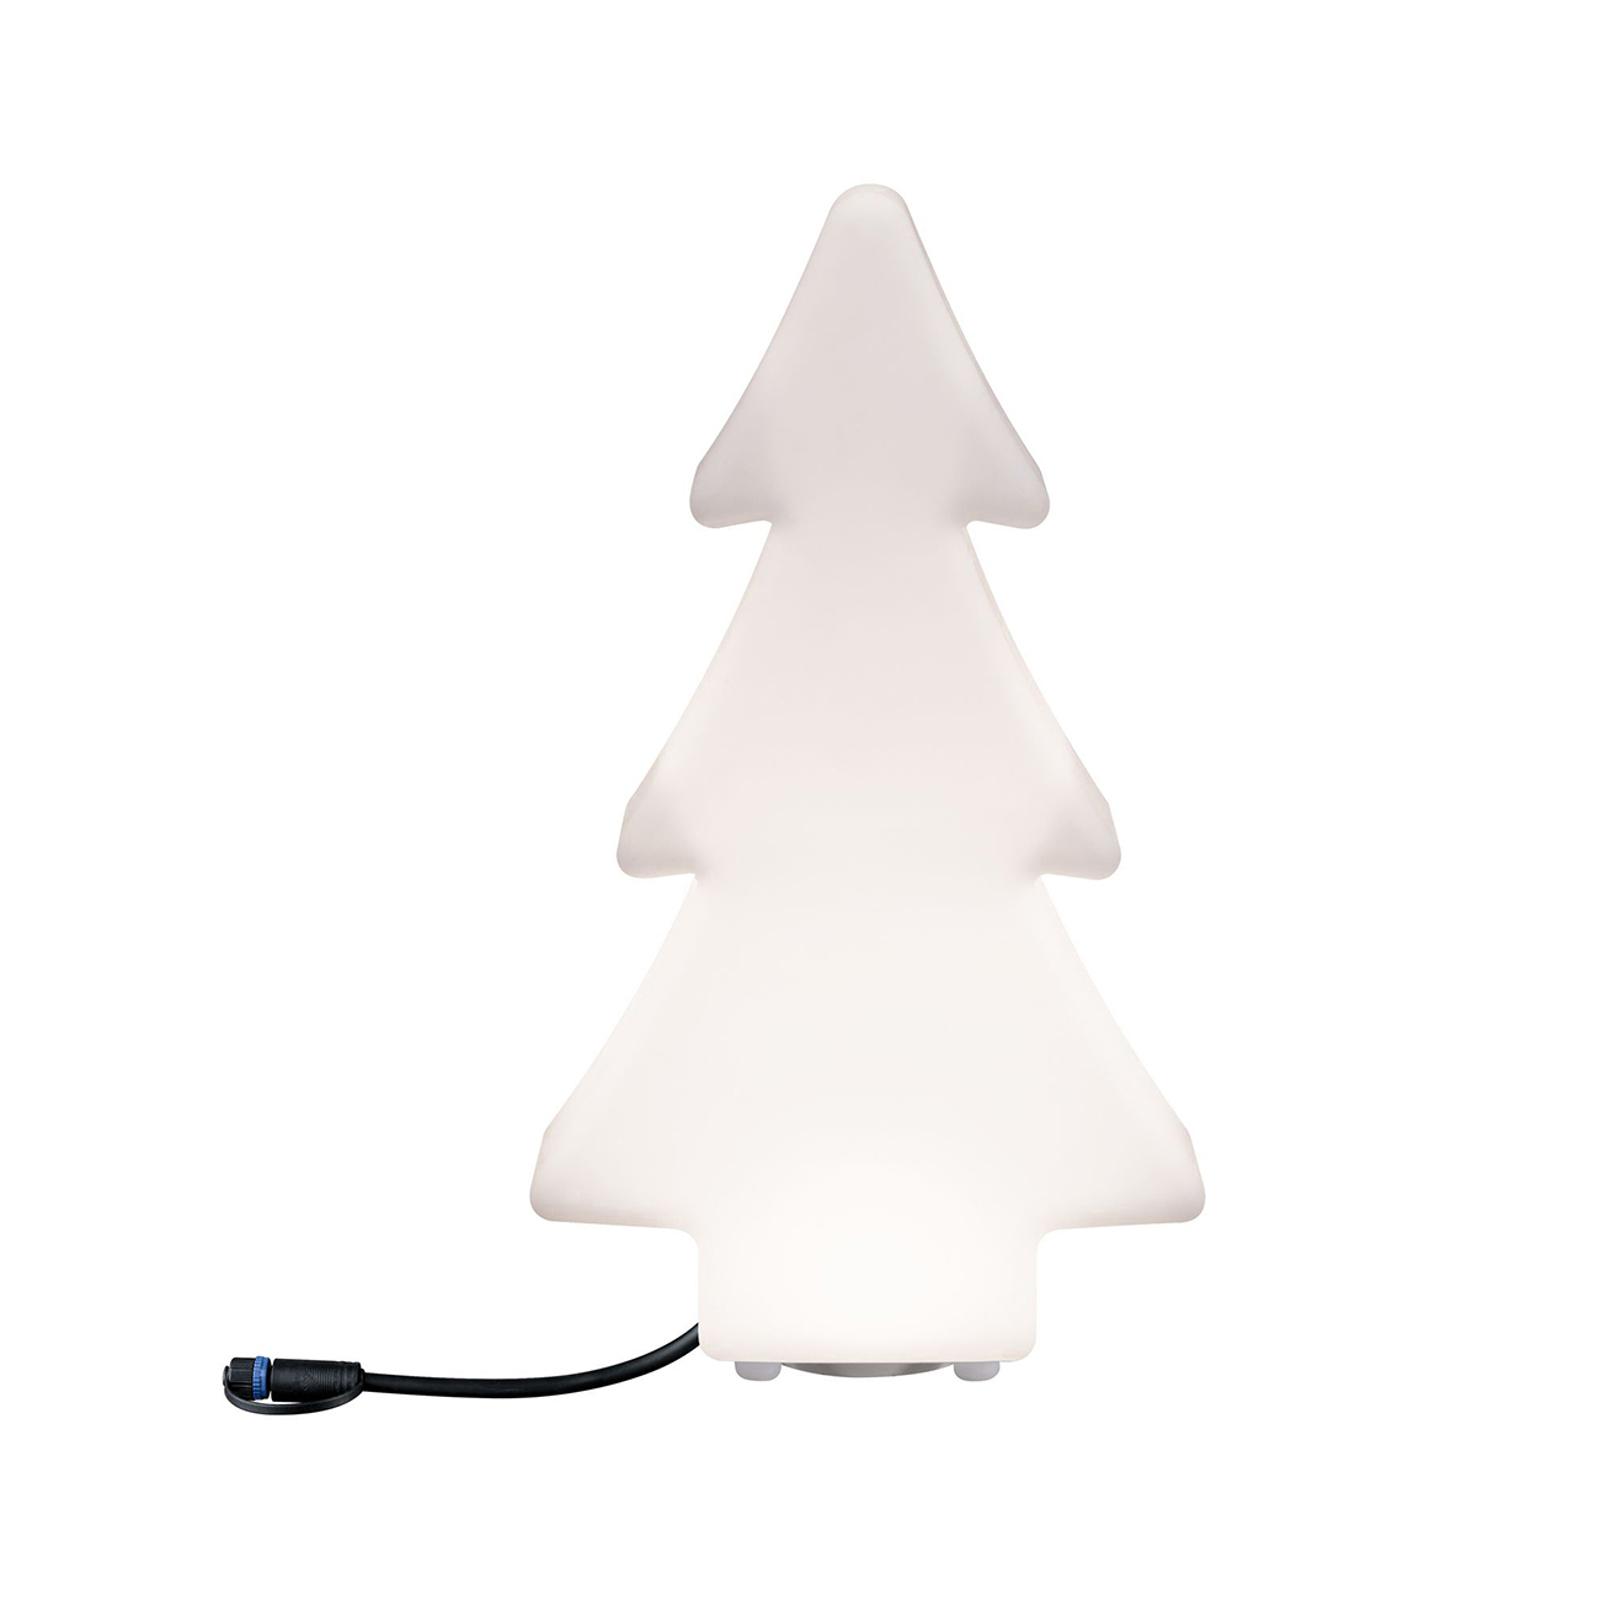 Paulmann Plug & Shine lampe décorative LED Tree